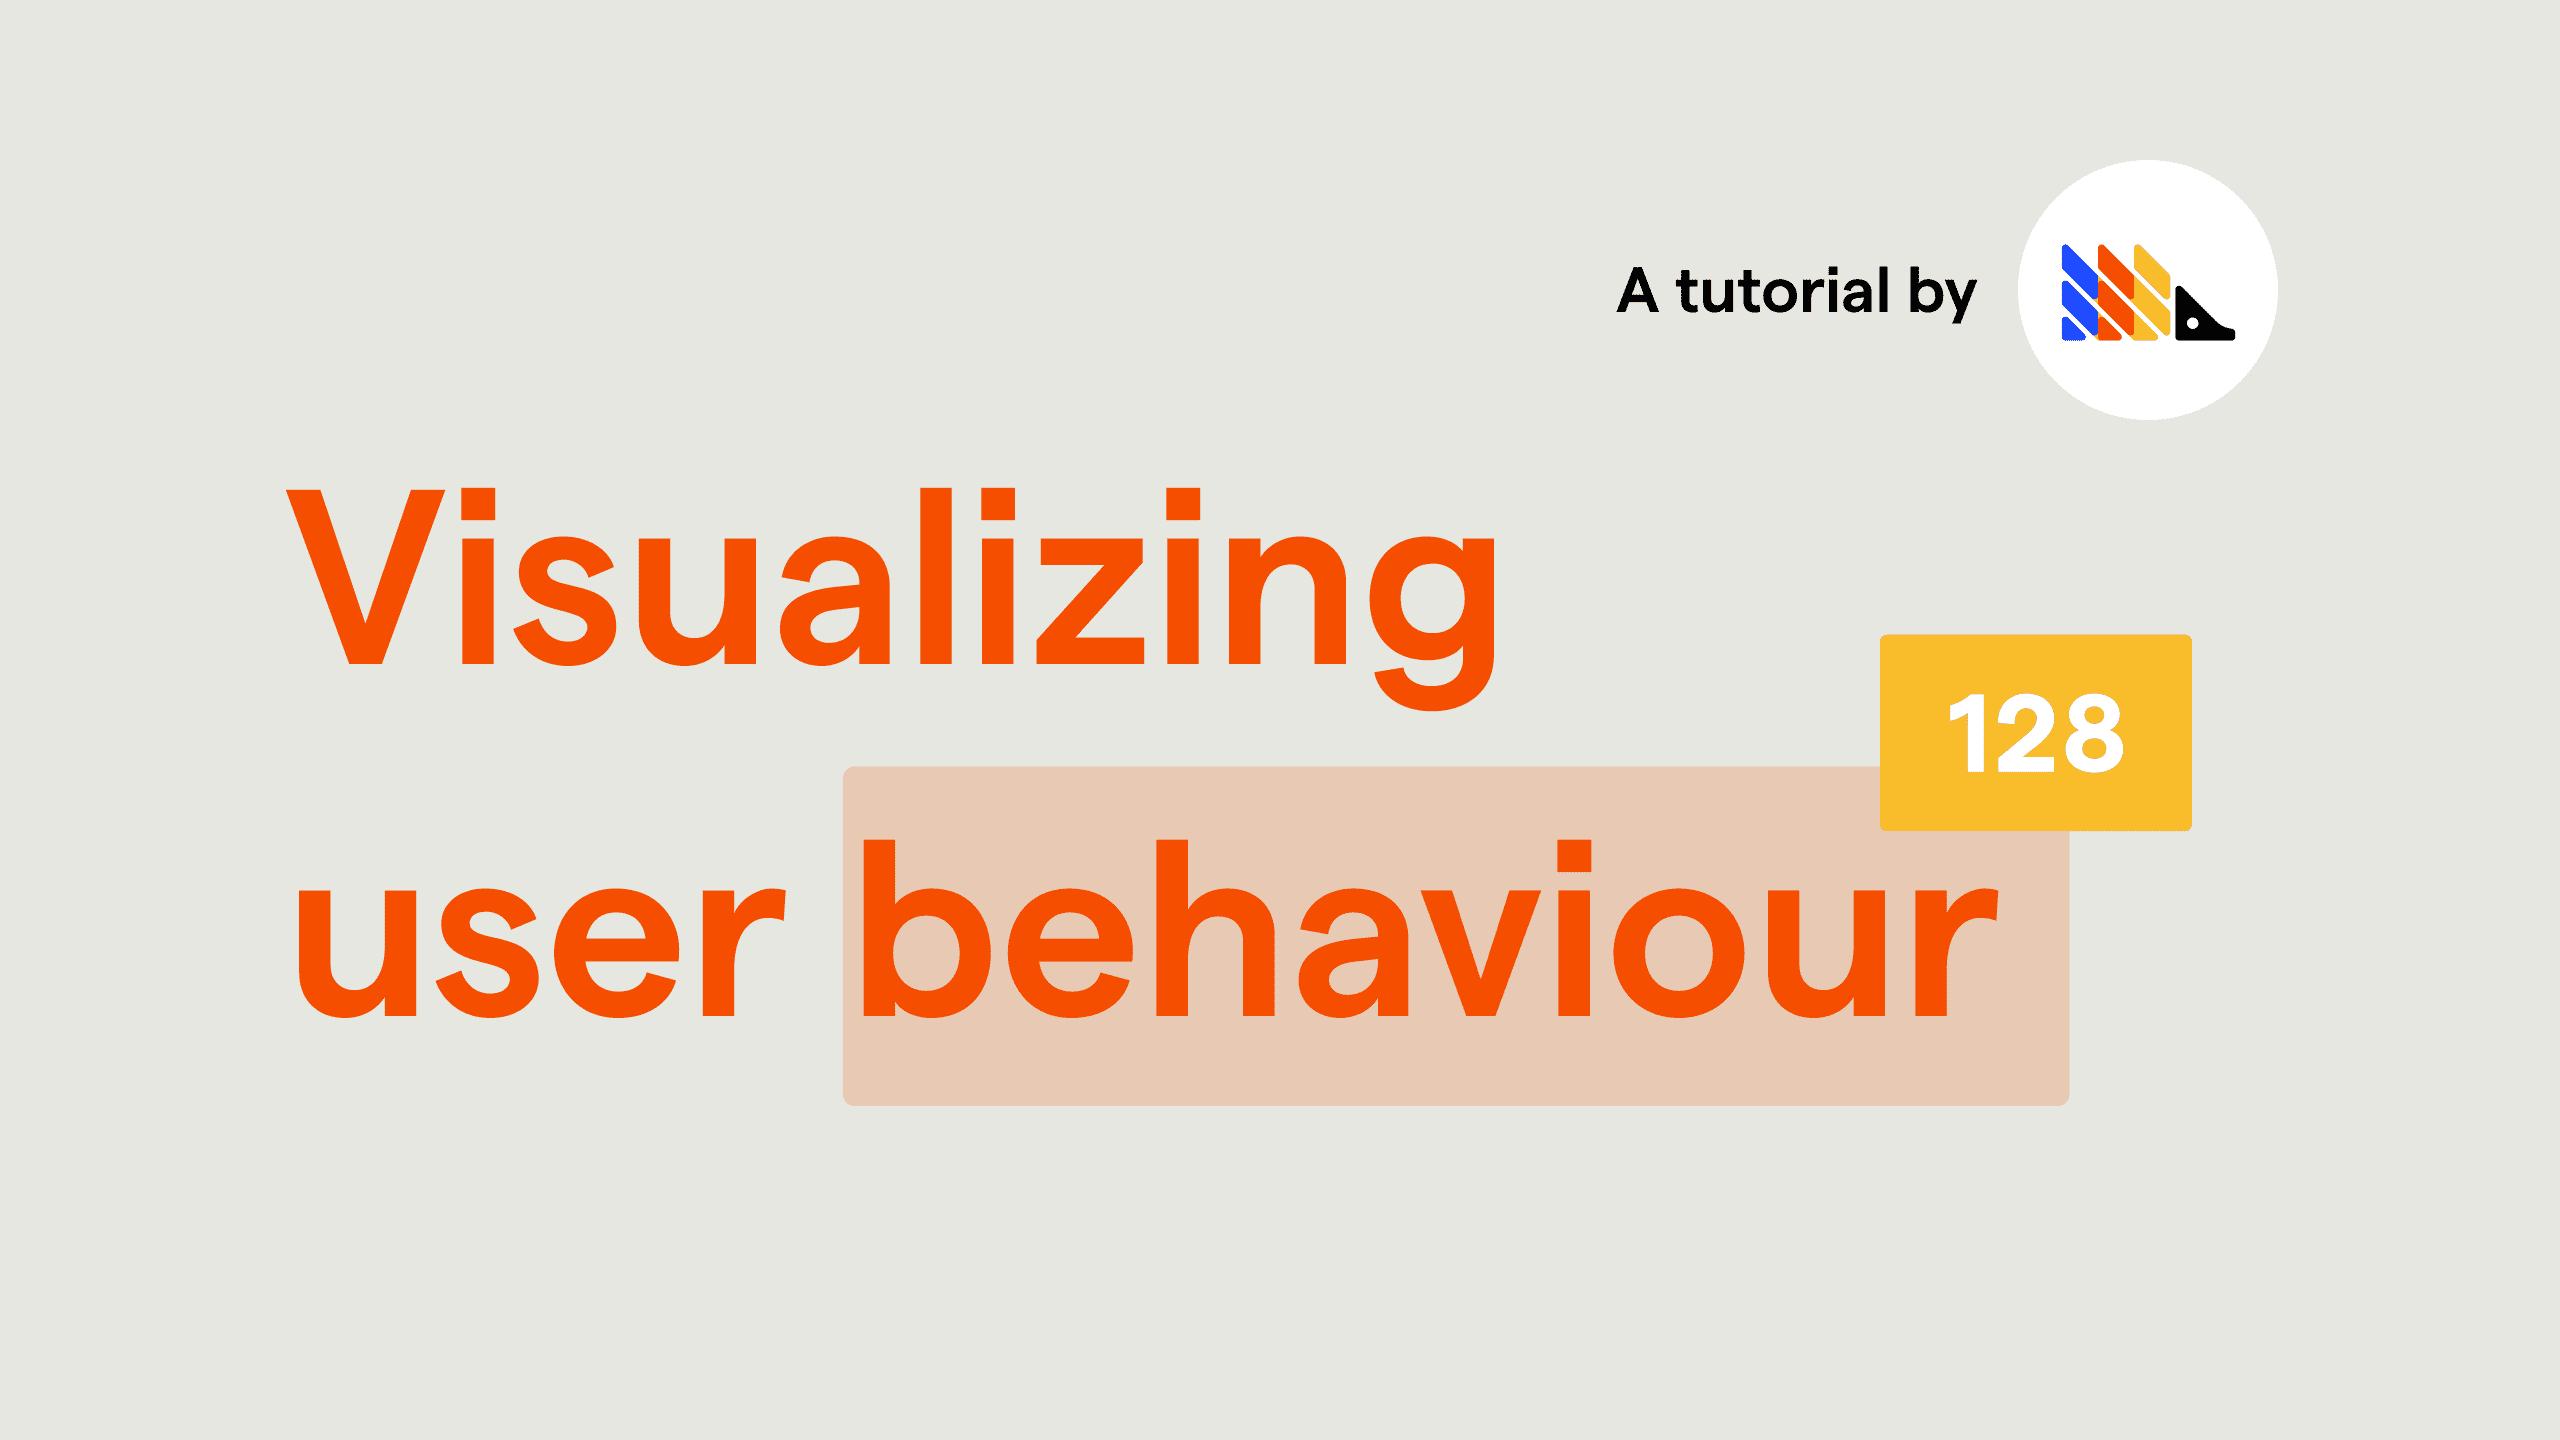 Visualizing user behavior - Toolbar